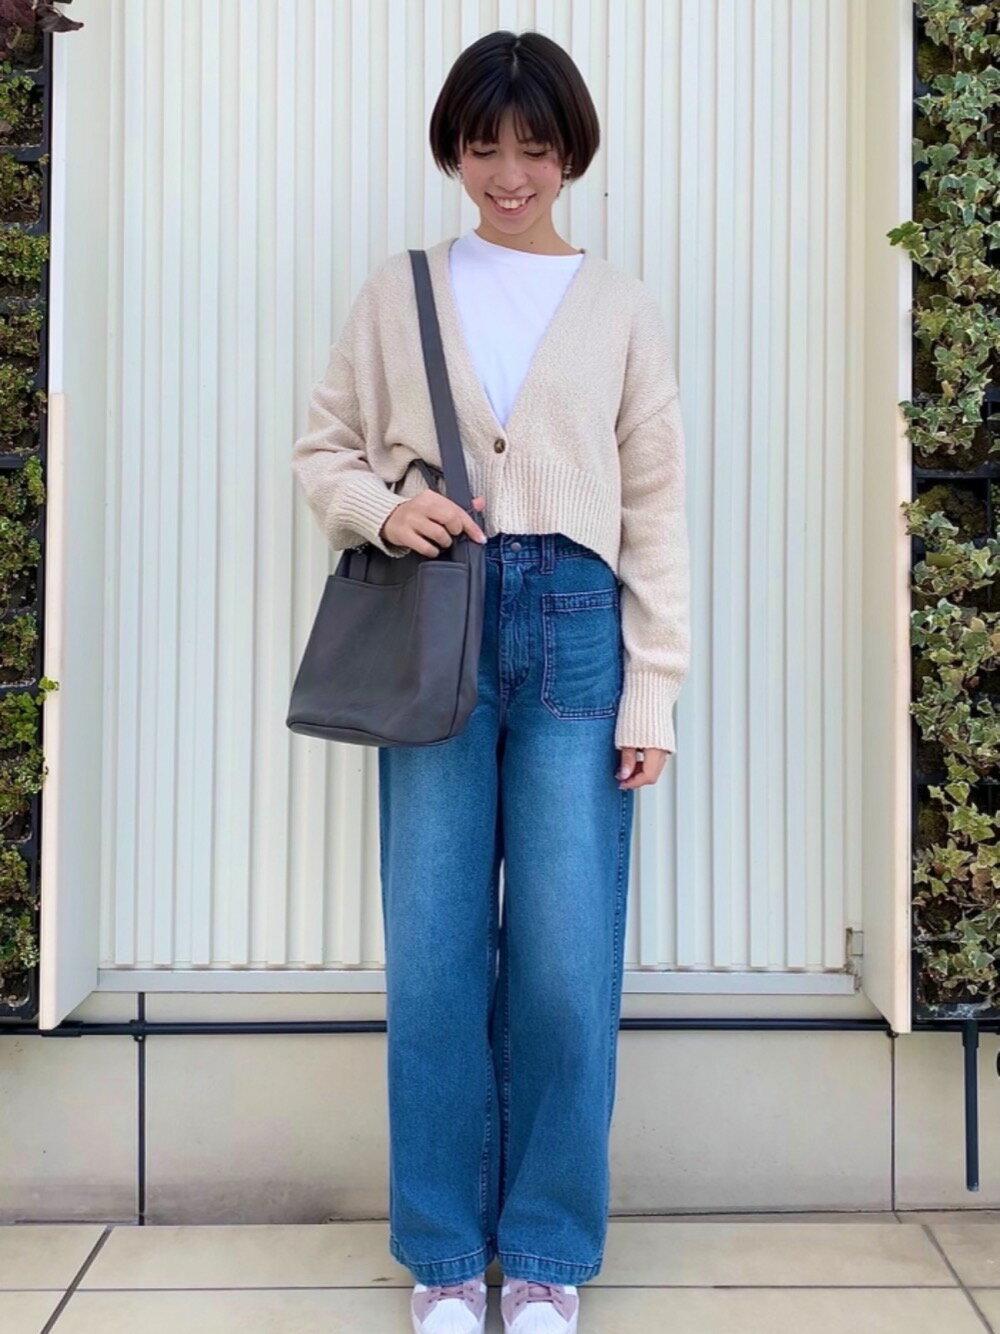 coenのCOOLMAX(クールマックス)オールシーズン調温ロングスリーブシャツテールTシャツ#を使ったコーディネートを紹介します。|Rakuten Fashion(楽天ファッション/旧楽天ブランドアベニュー)1101099